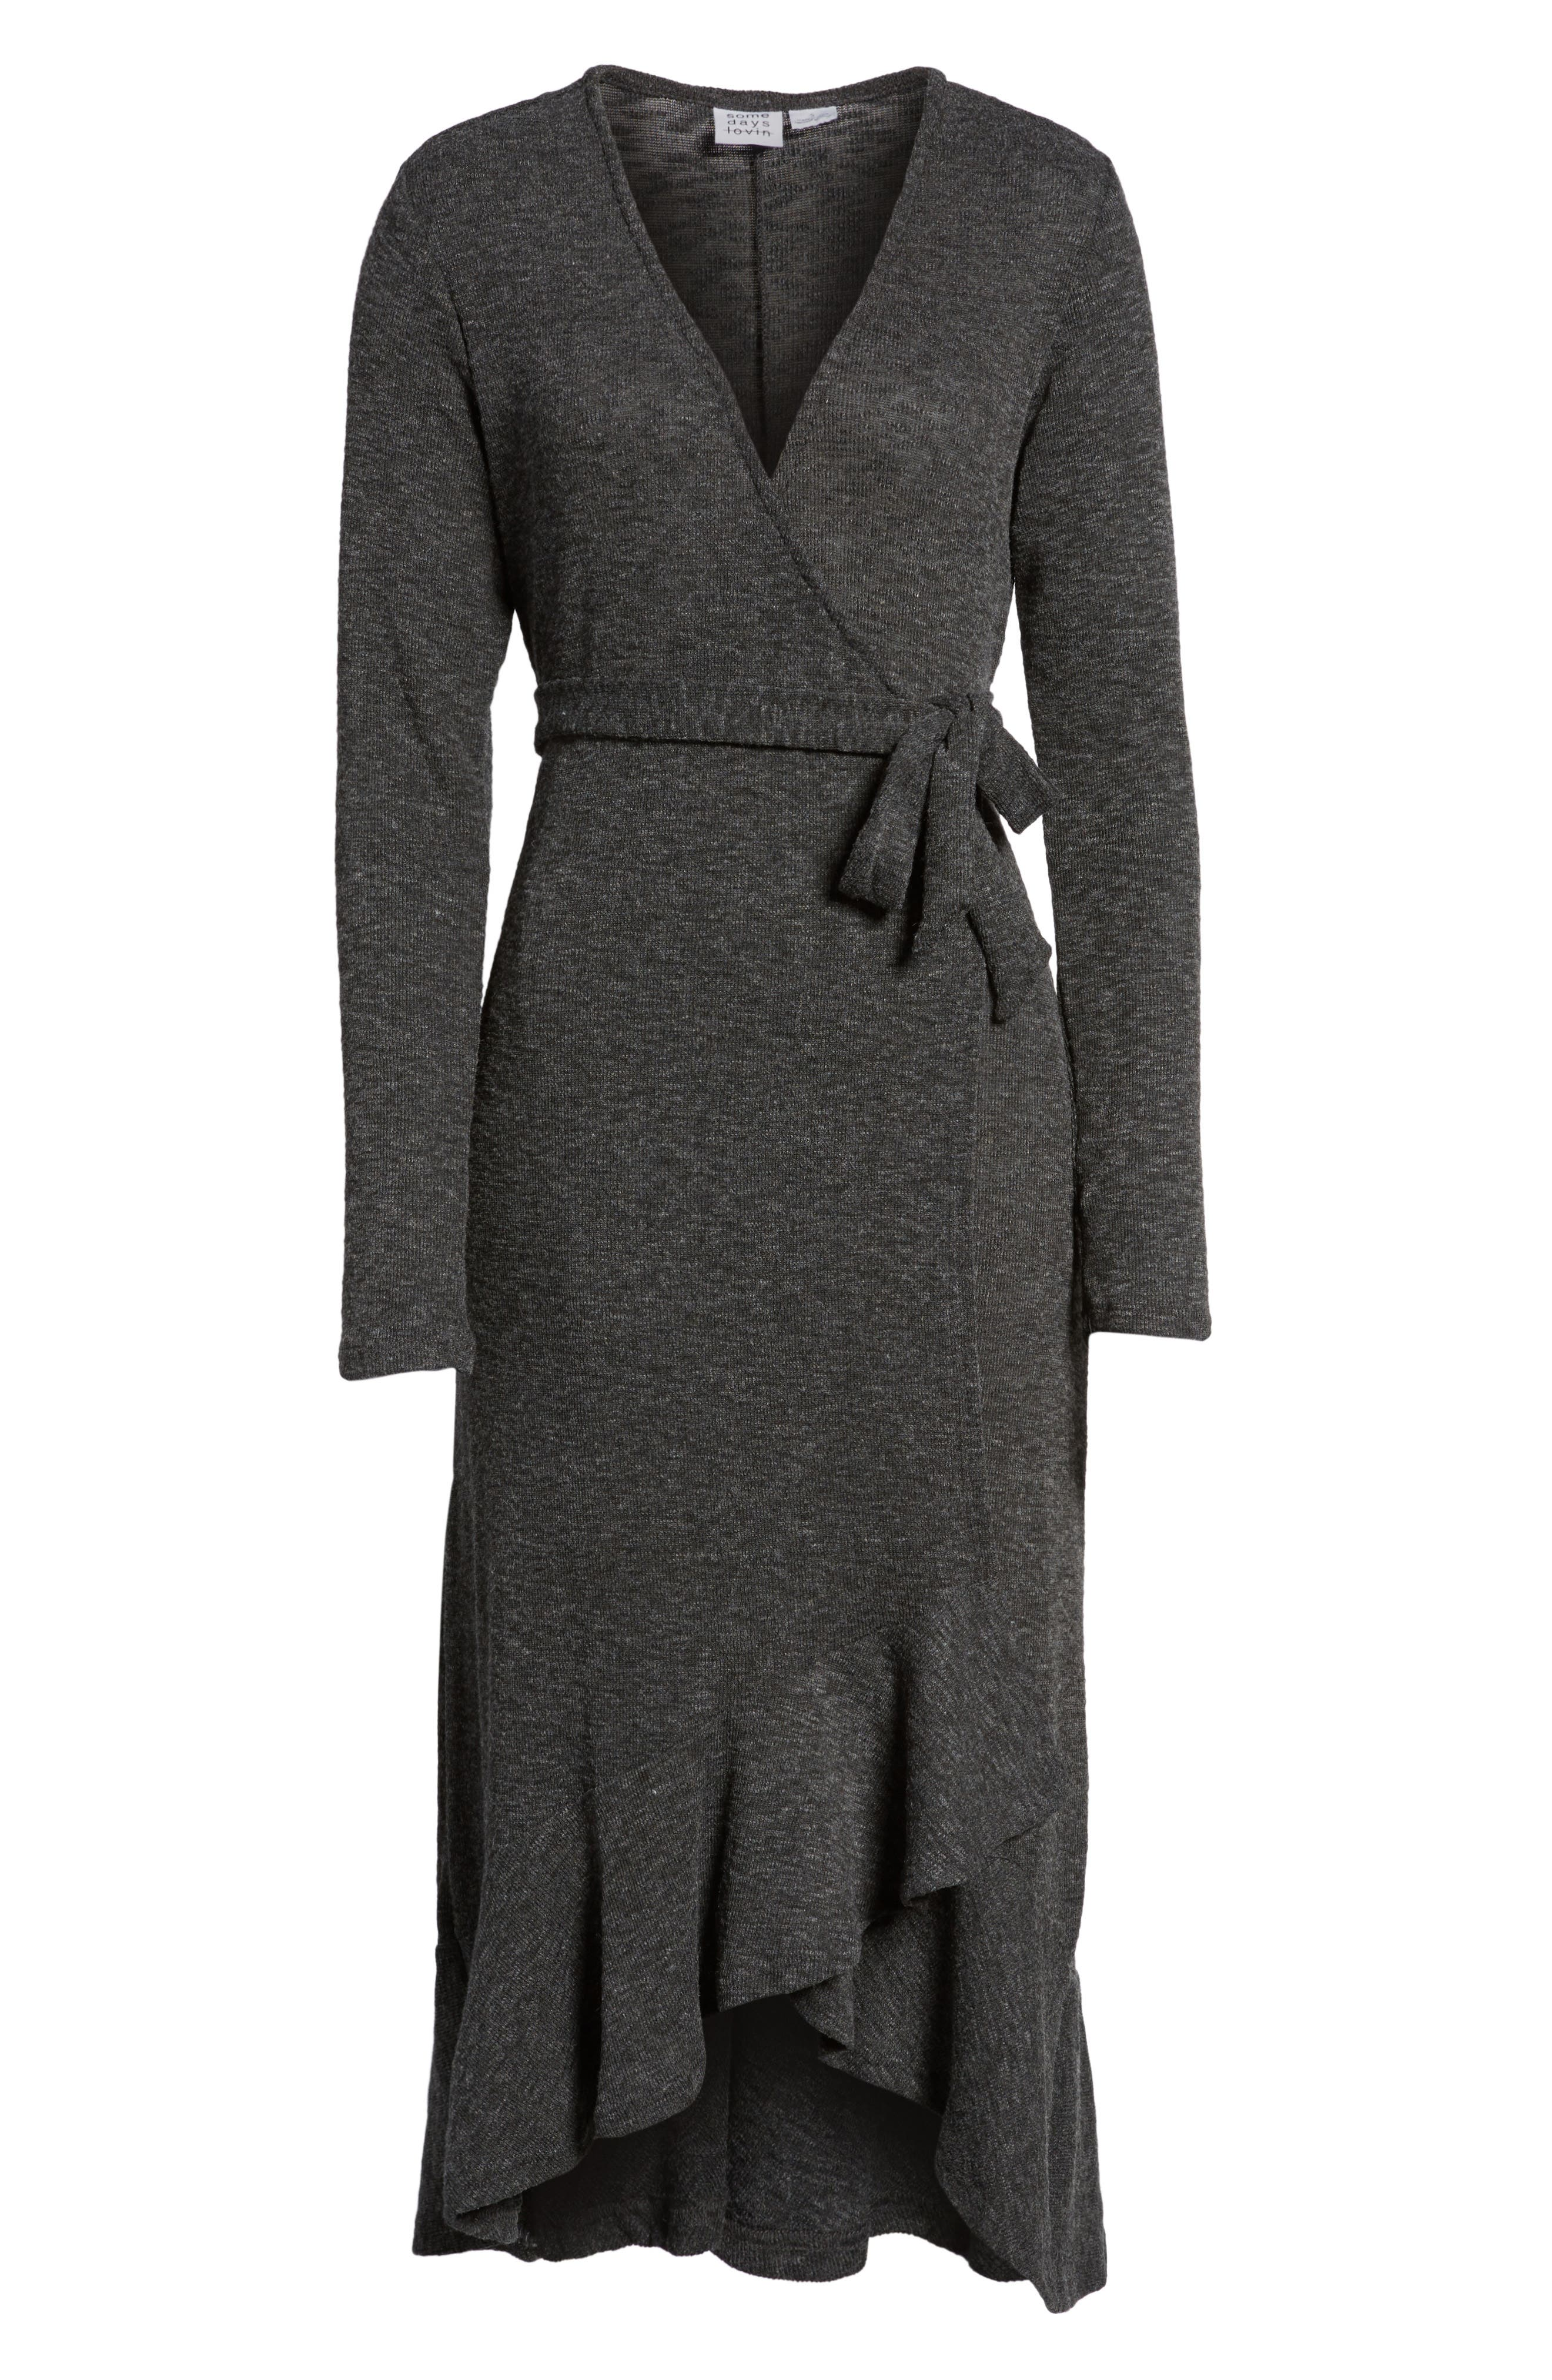 Winter Wandering Wrap Dress,                             Alternate thumbnail 6, color,                             020